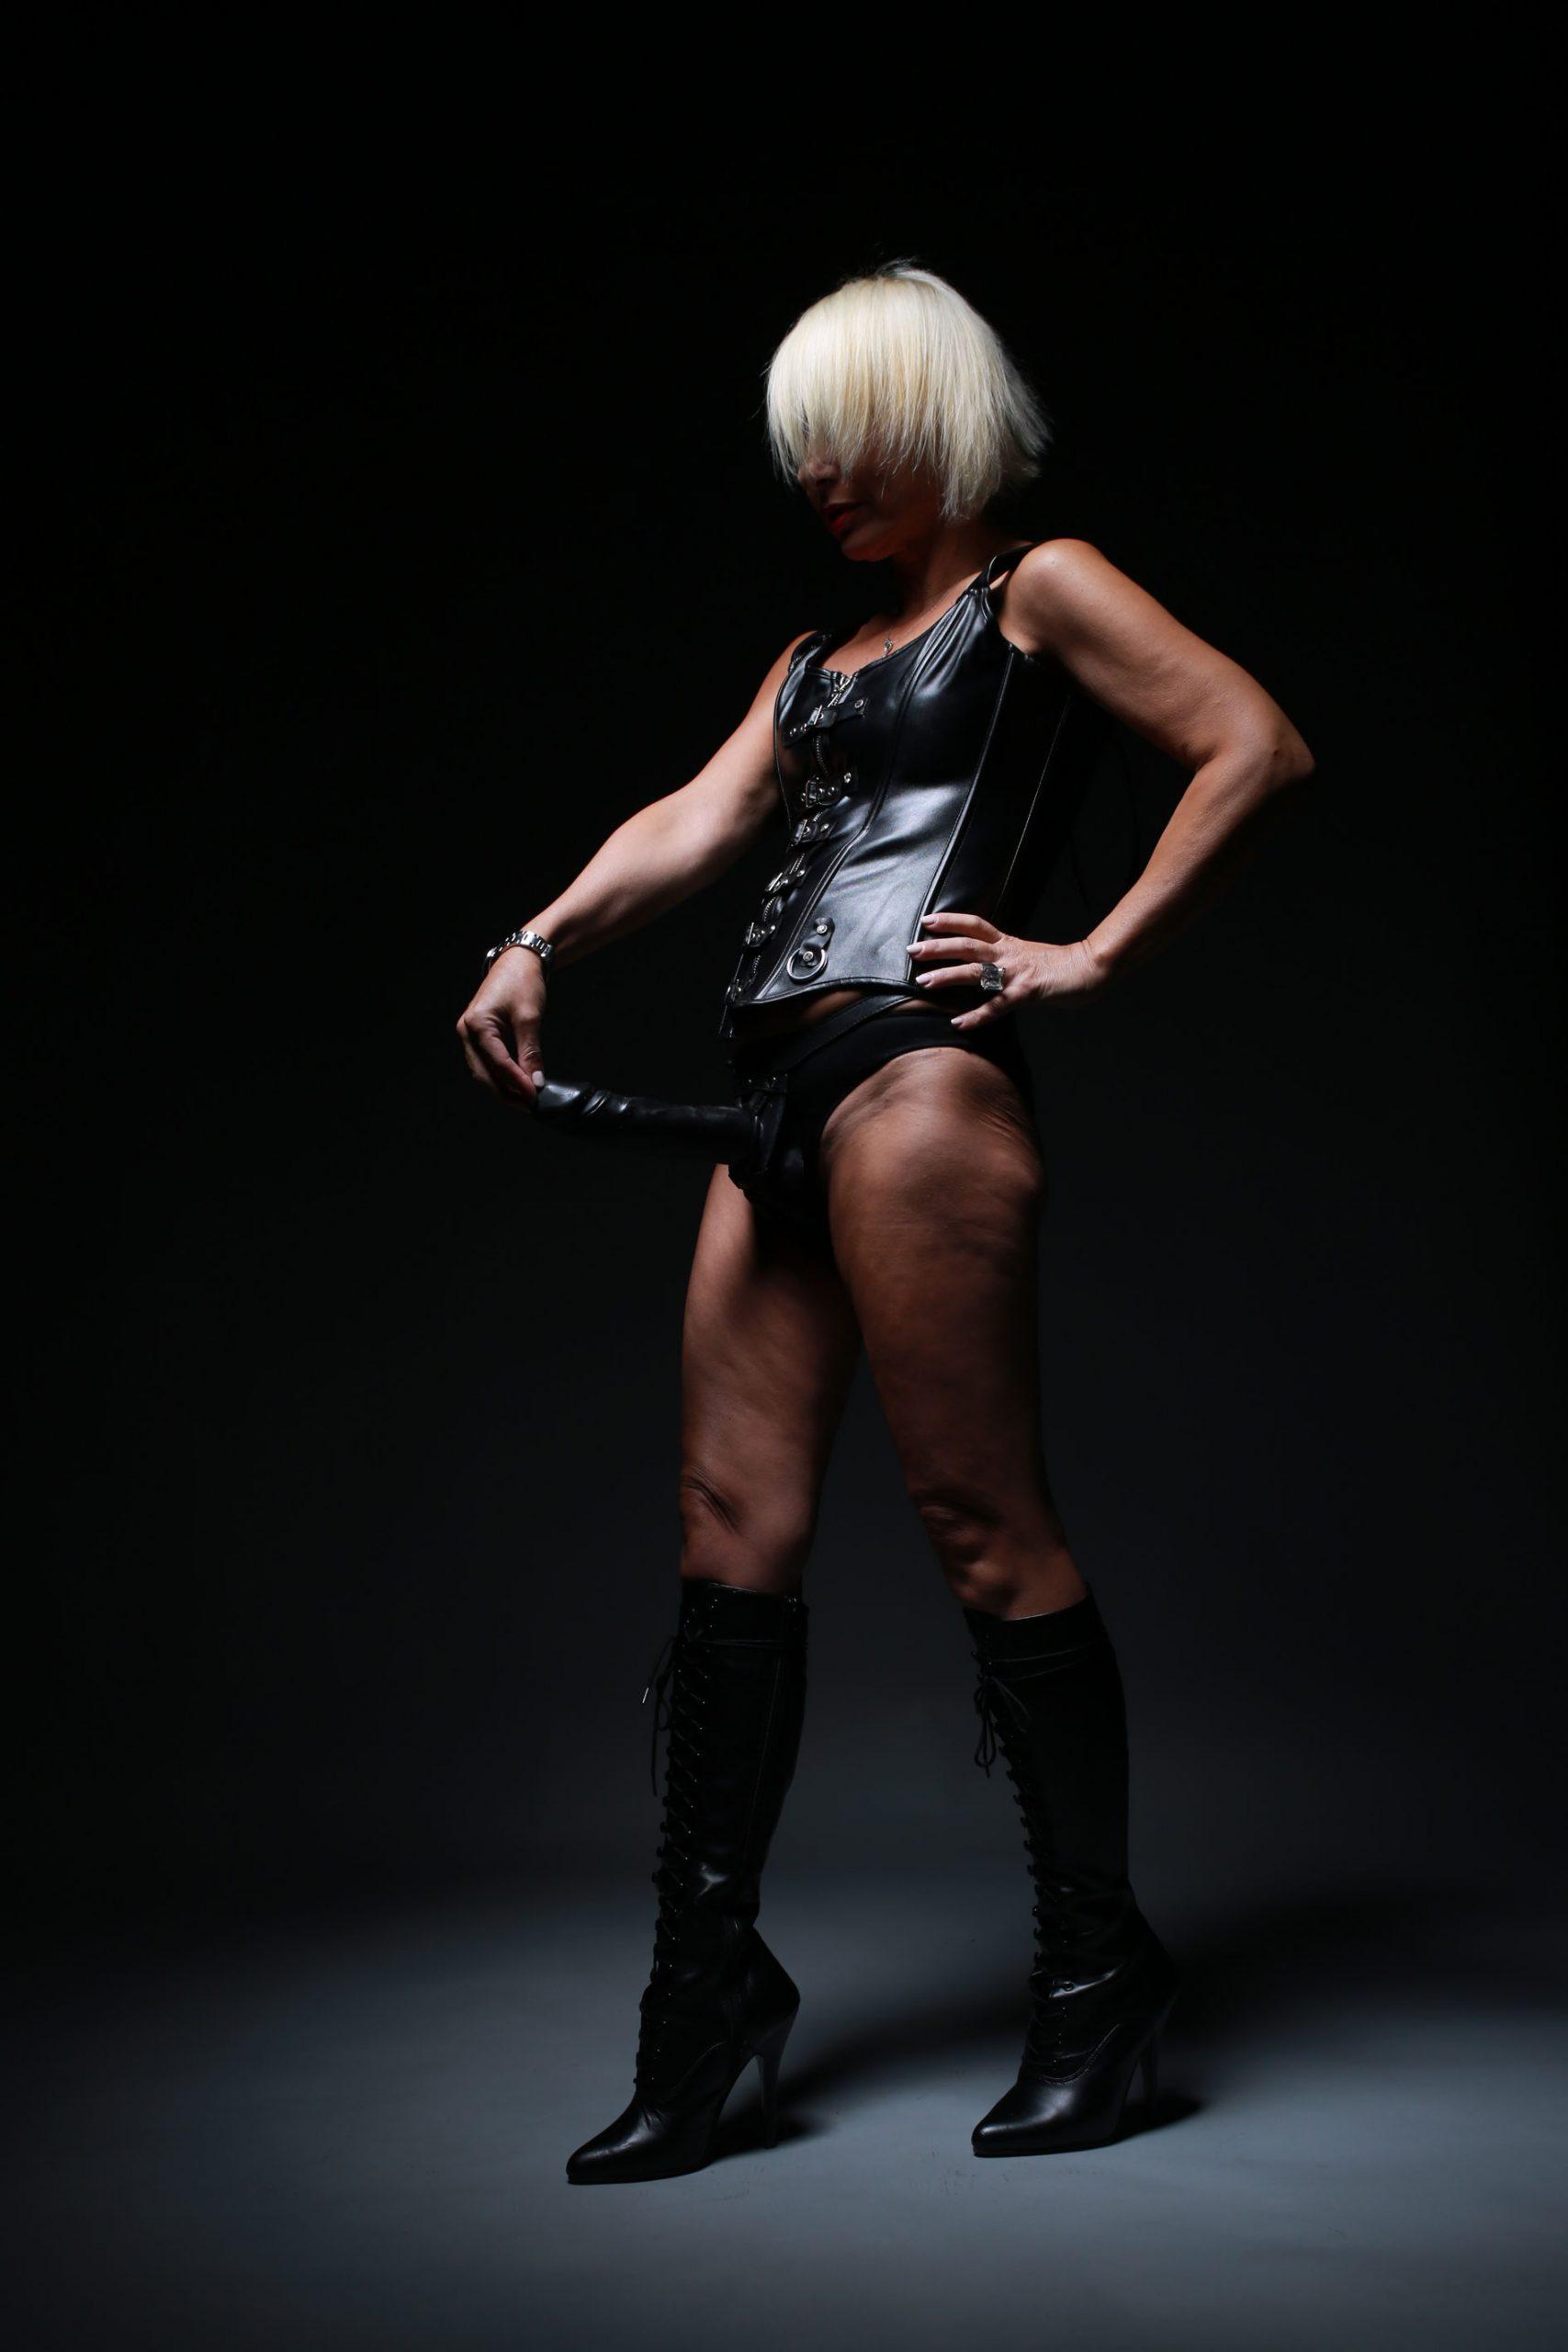 lily dupont mistress padrona milano italia adorazione piedi femdomme prodom bdsm fetish strapon pegging